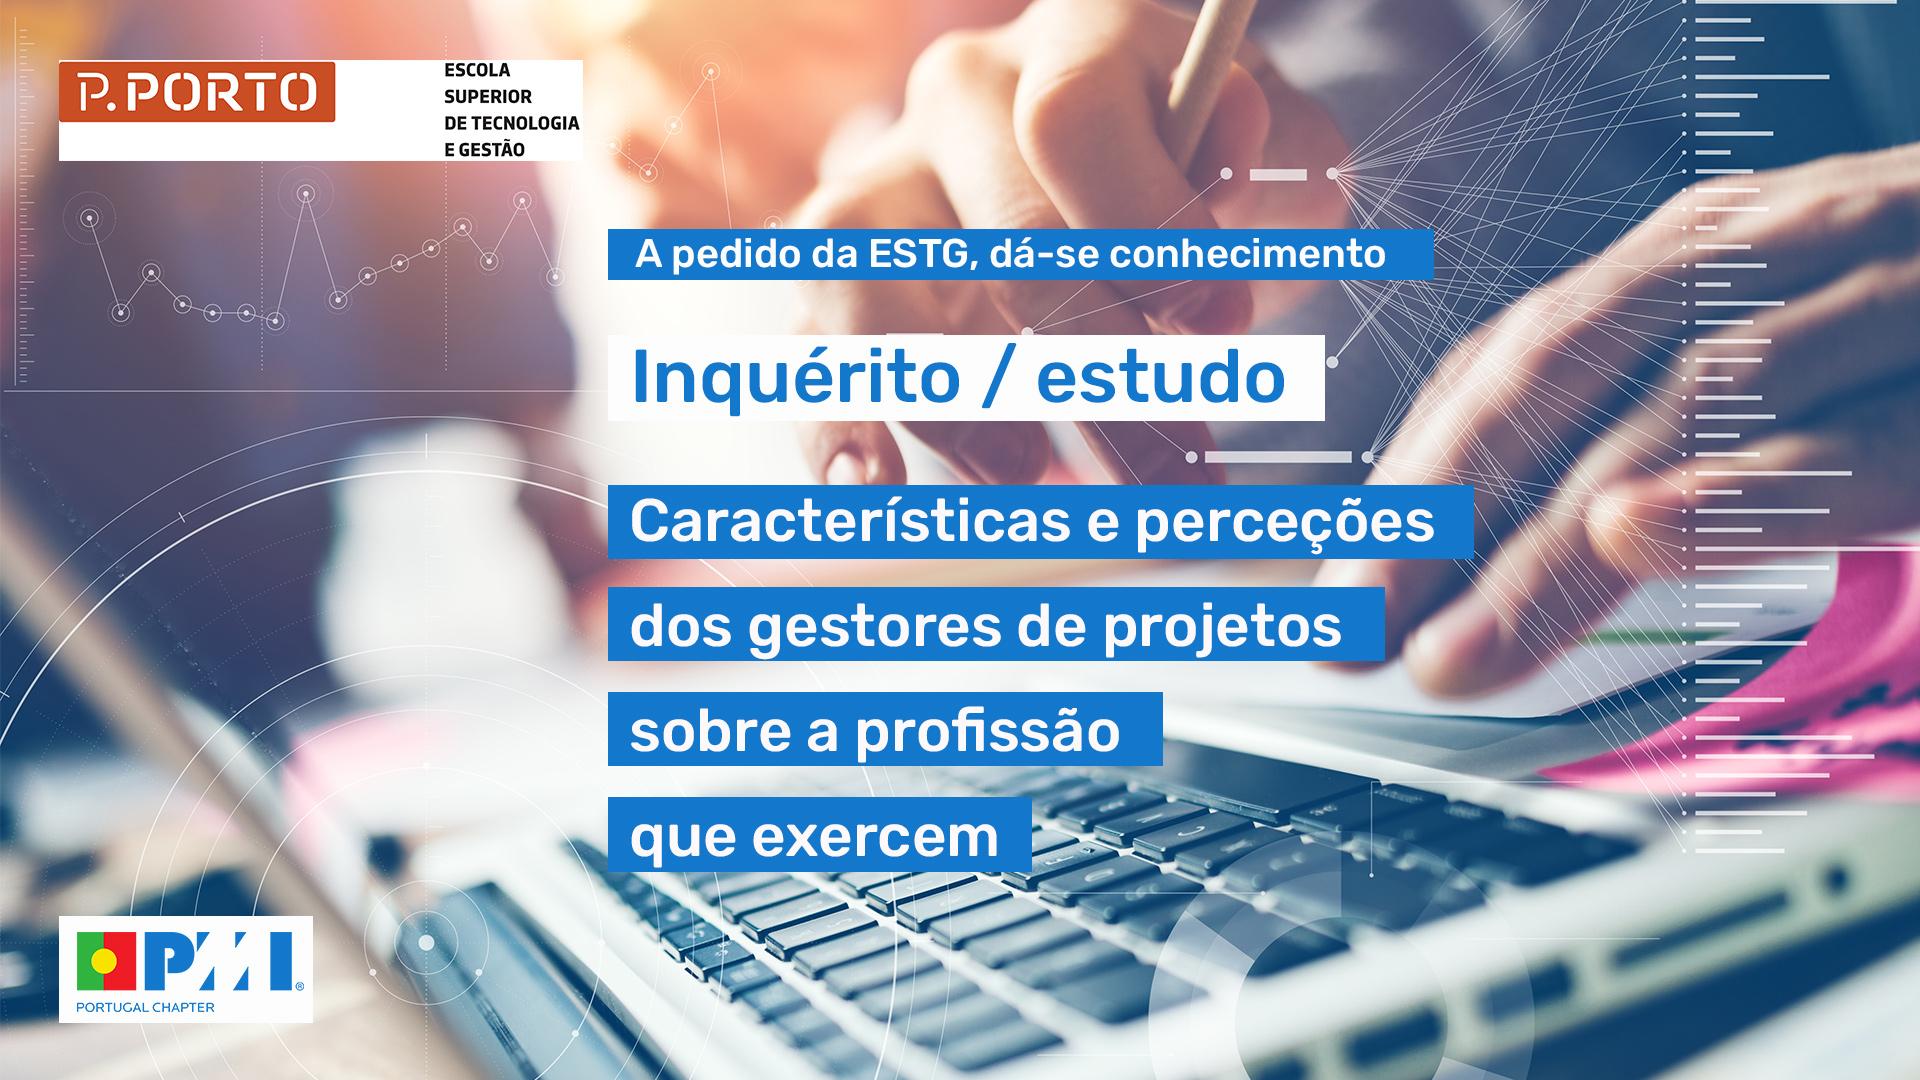 Caracteristicas sobre a profissão de Gestor de Projectos